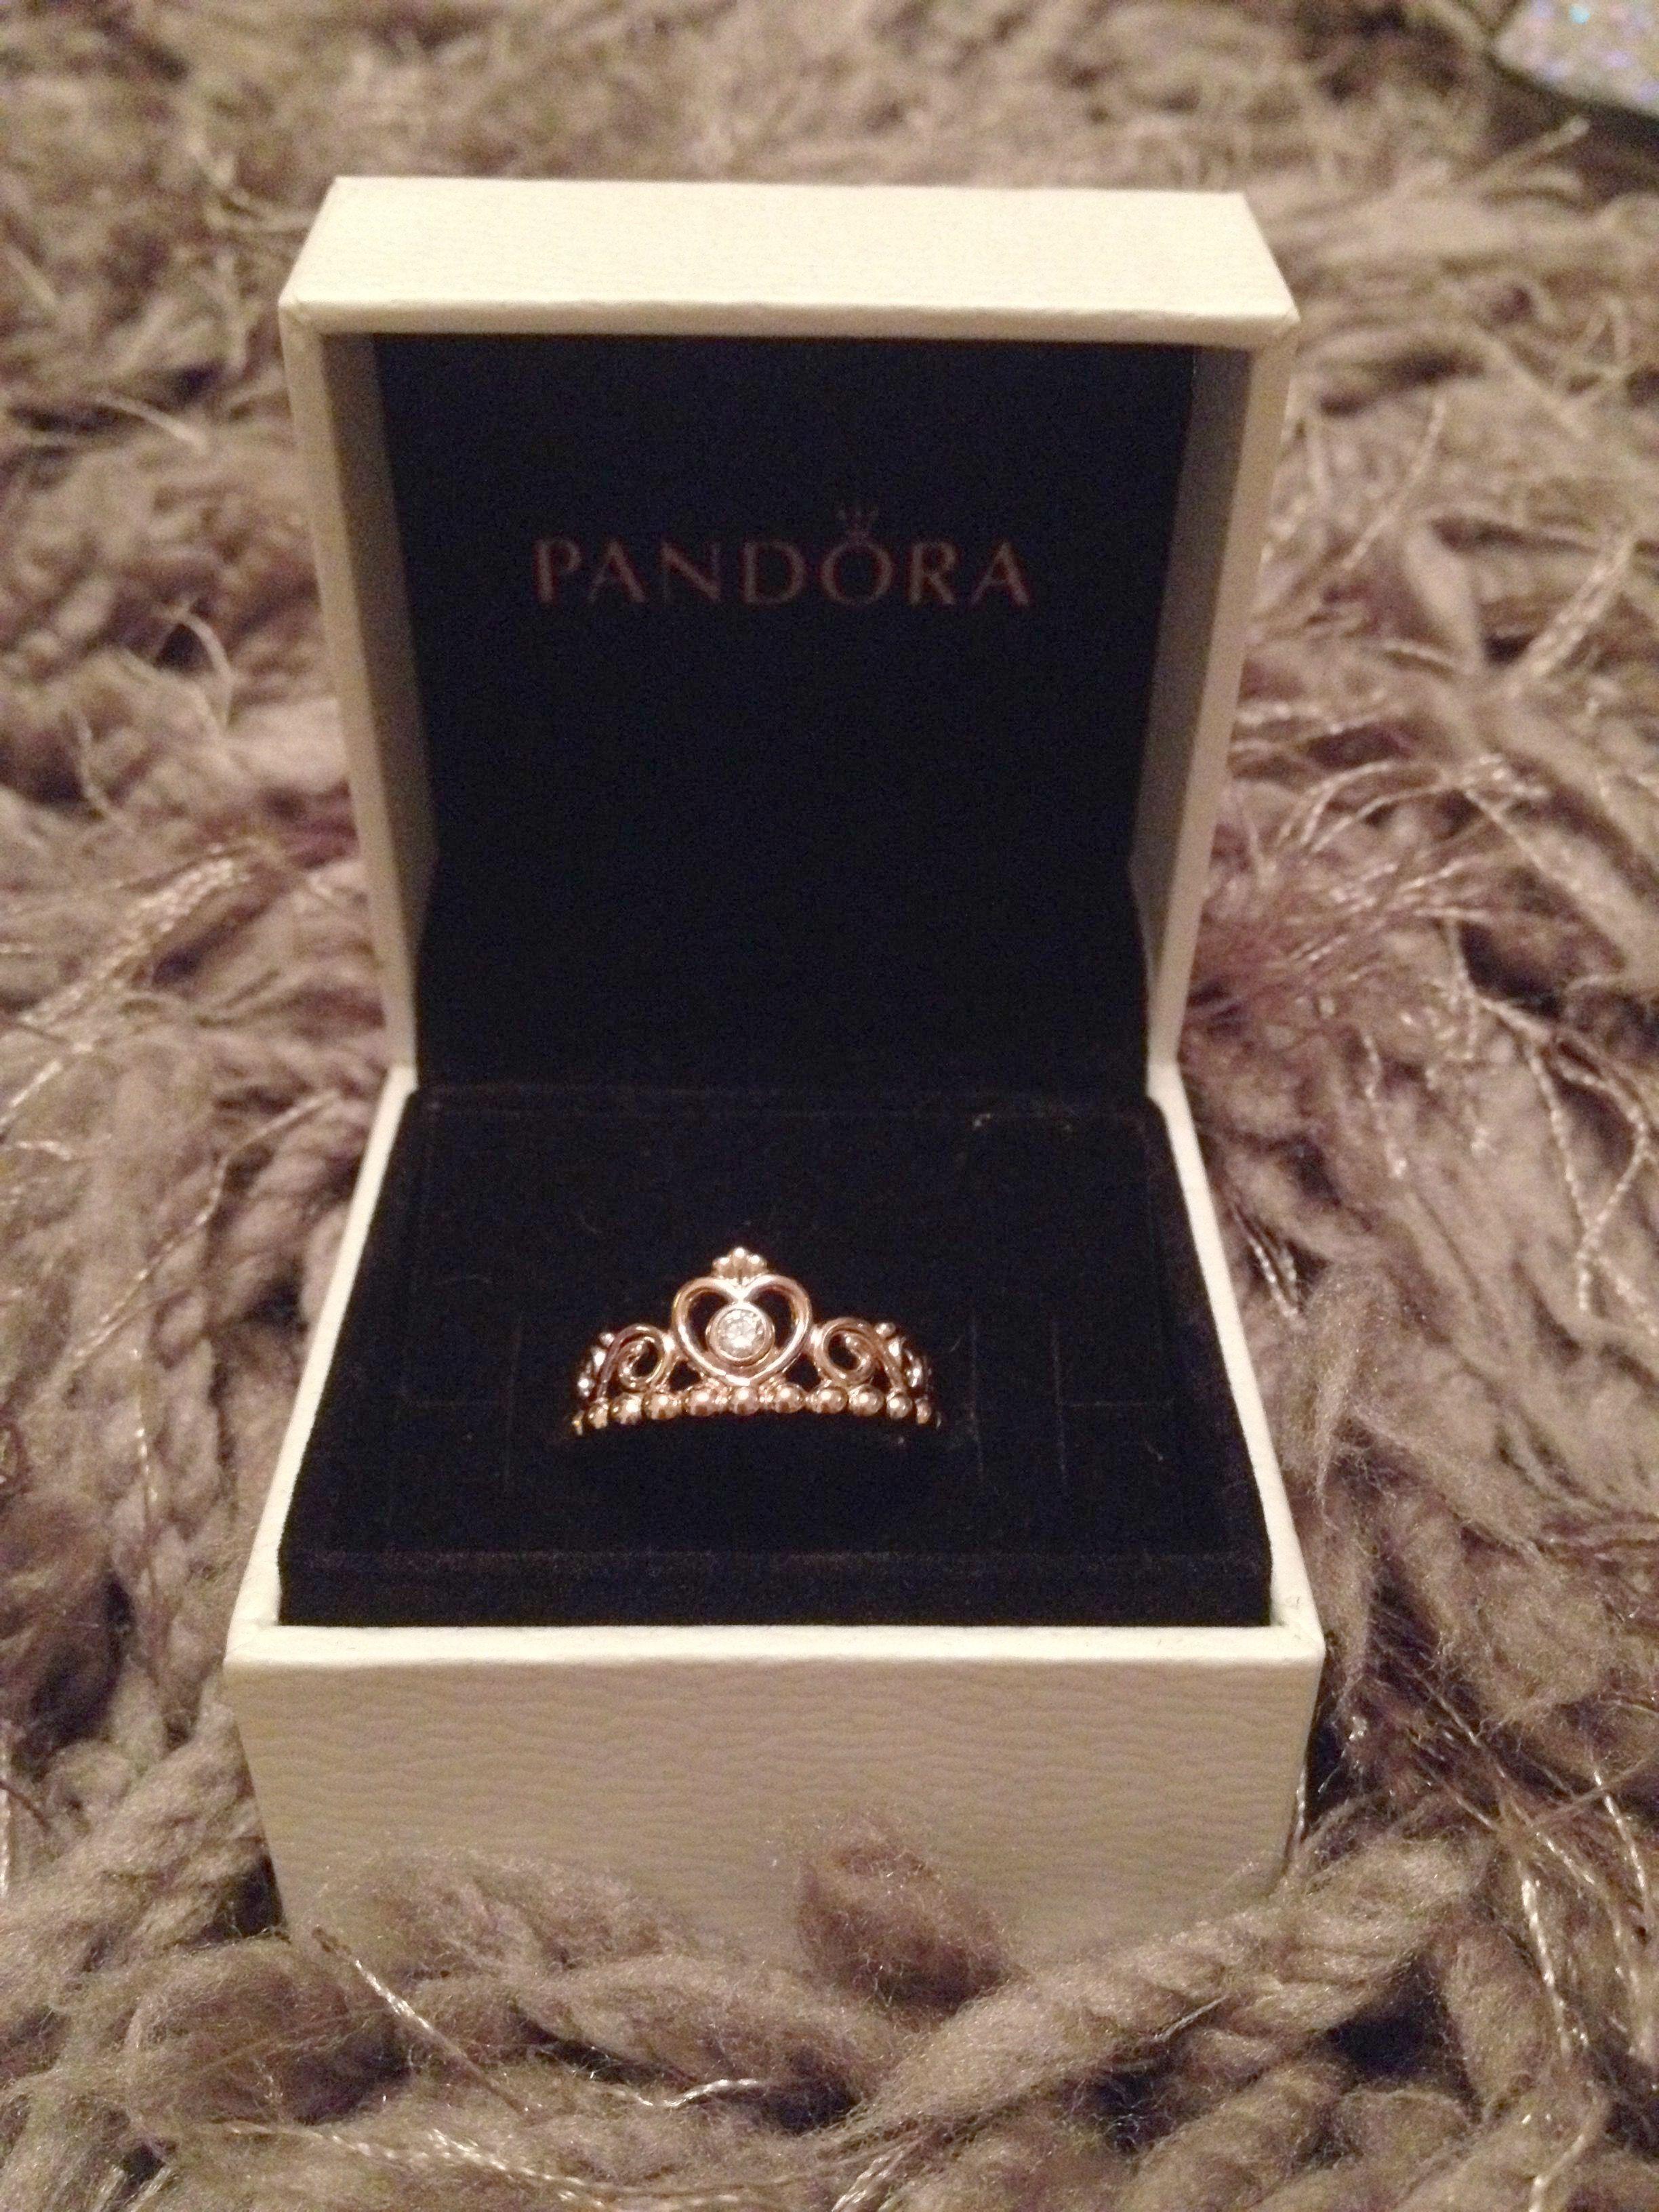 dcd5c4fed Pandora Rose Gold Heart Earrings Pandora Diamond Promise Rings ...